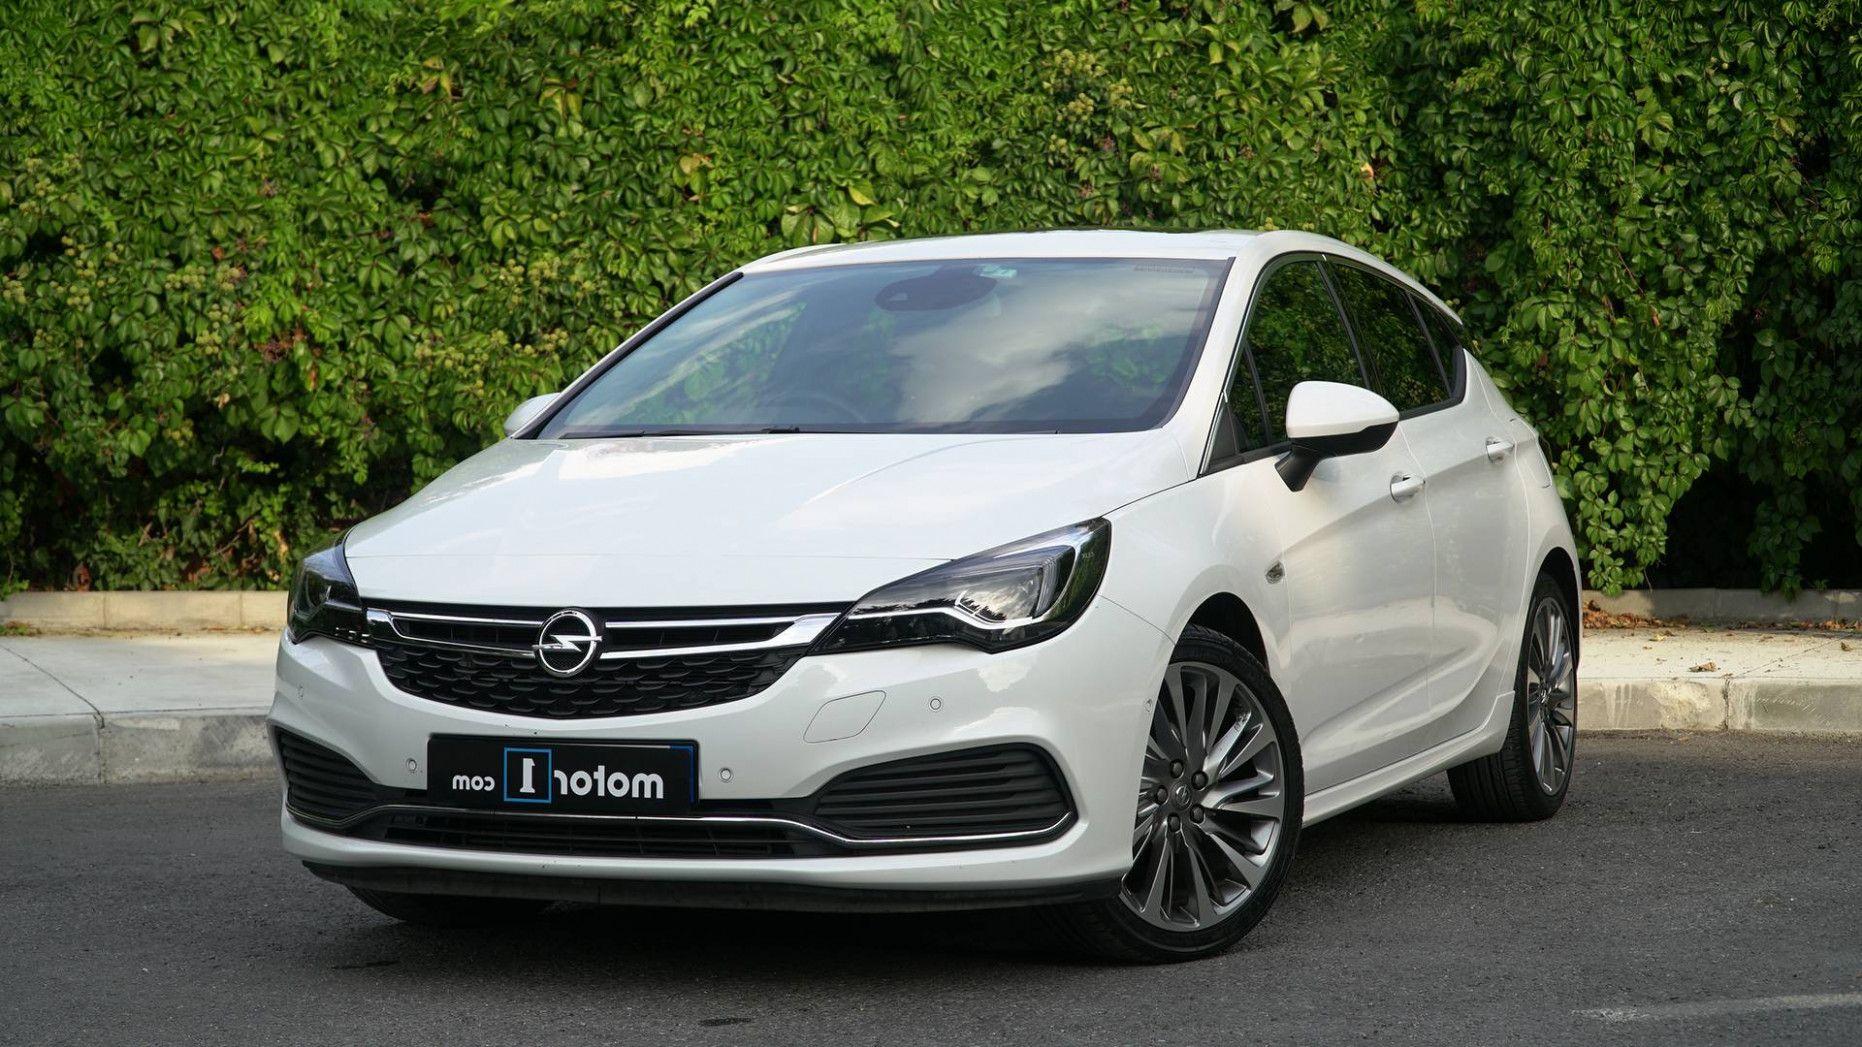 Ten Reliable Sources To Learn About Opel Fiyat Listesi 2020 Pdf Opel Vauxhall Corsa Ten